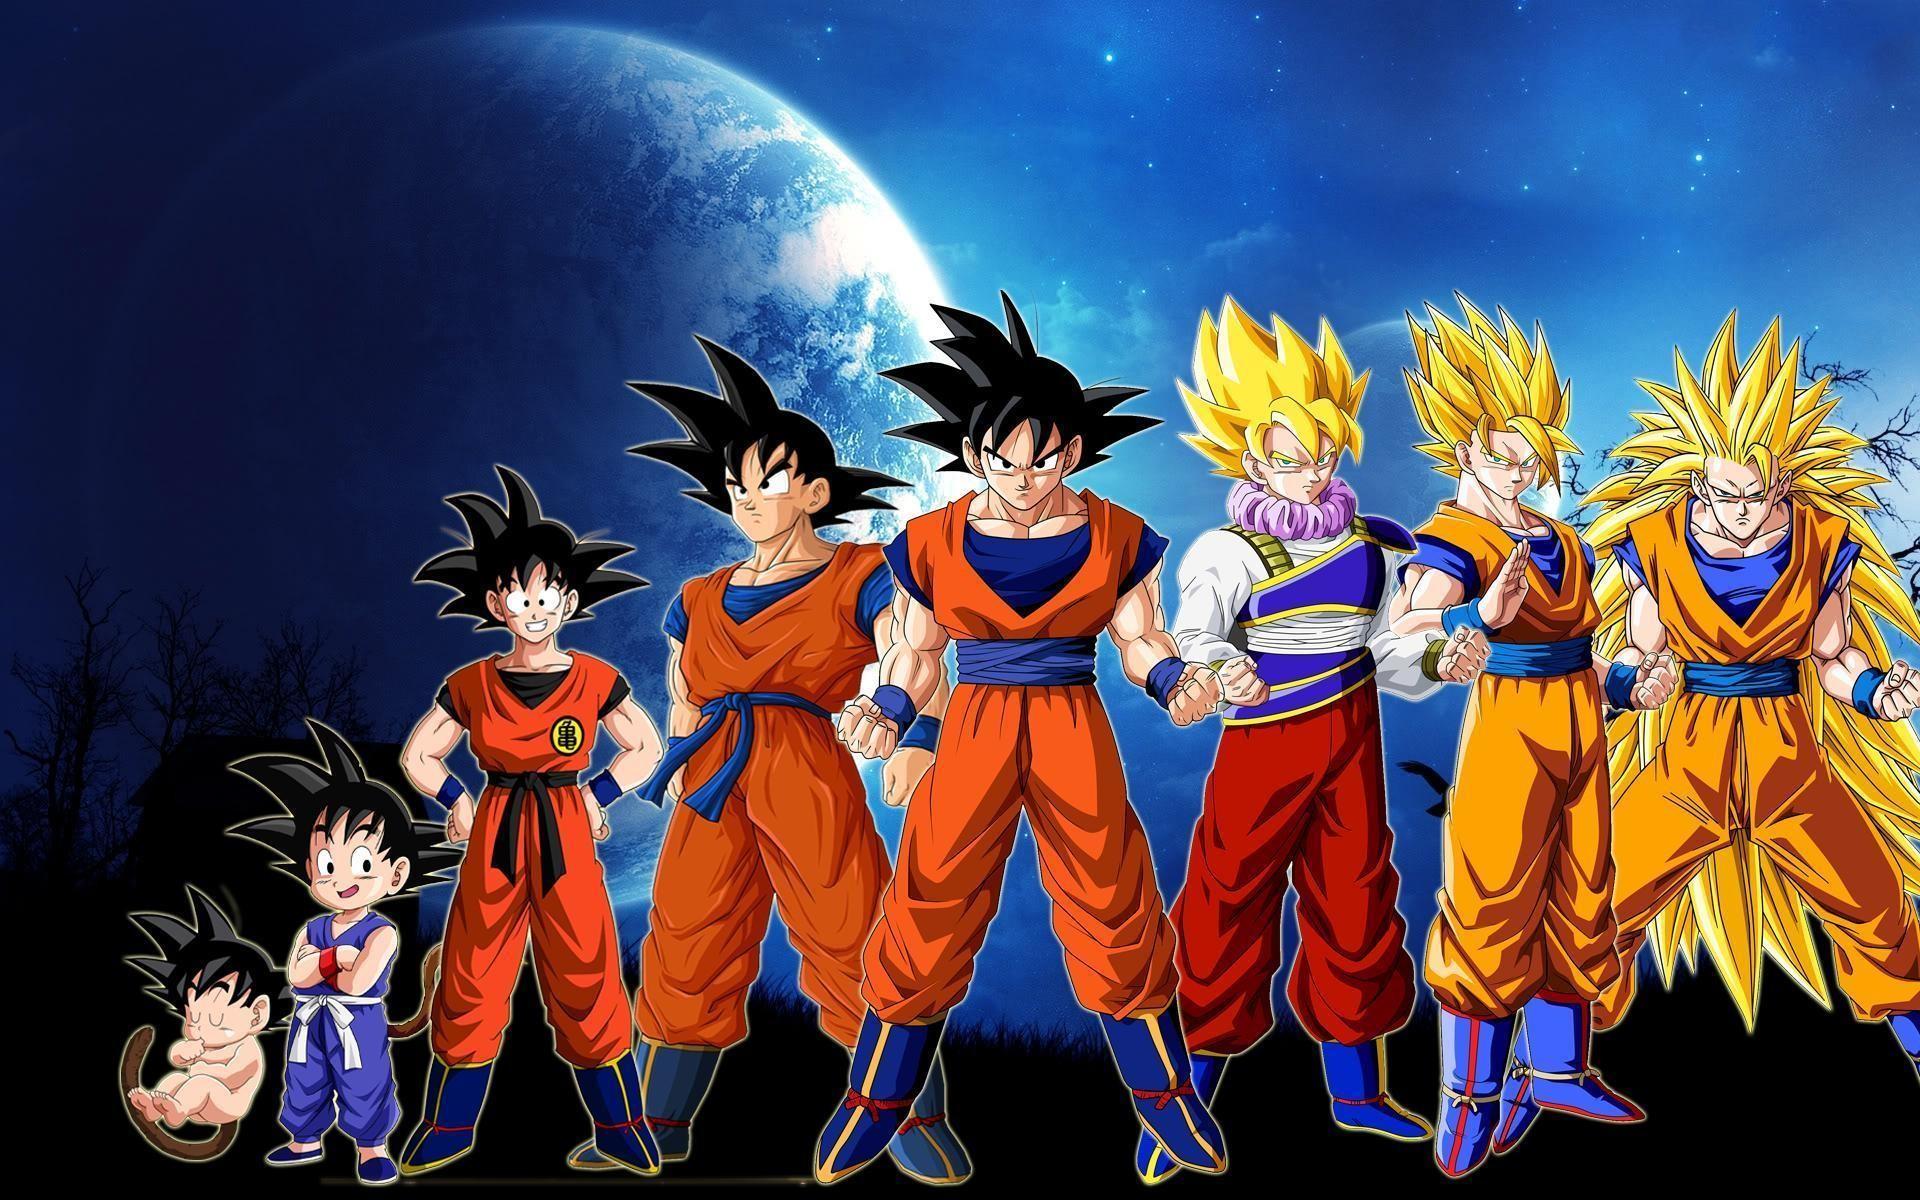 Dragon Ball Z Goku Story Wallpaper For Iphone   Cartoons Images